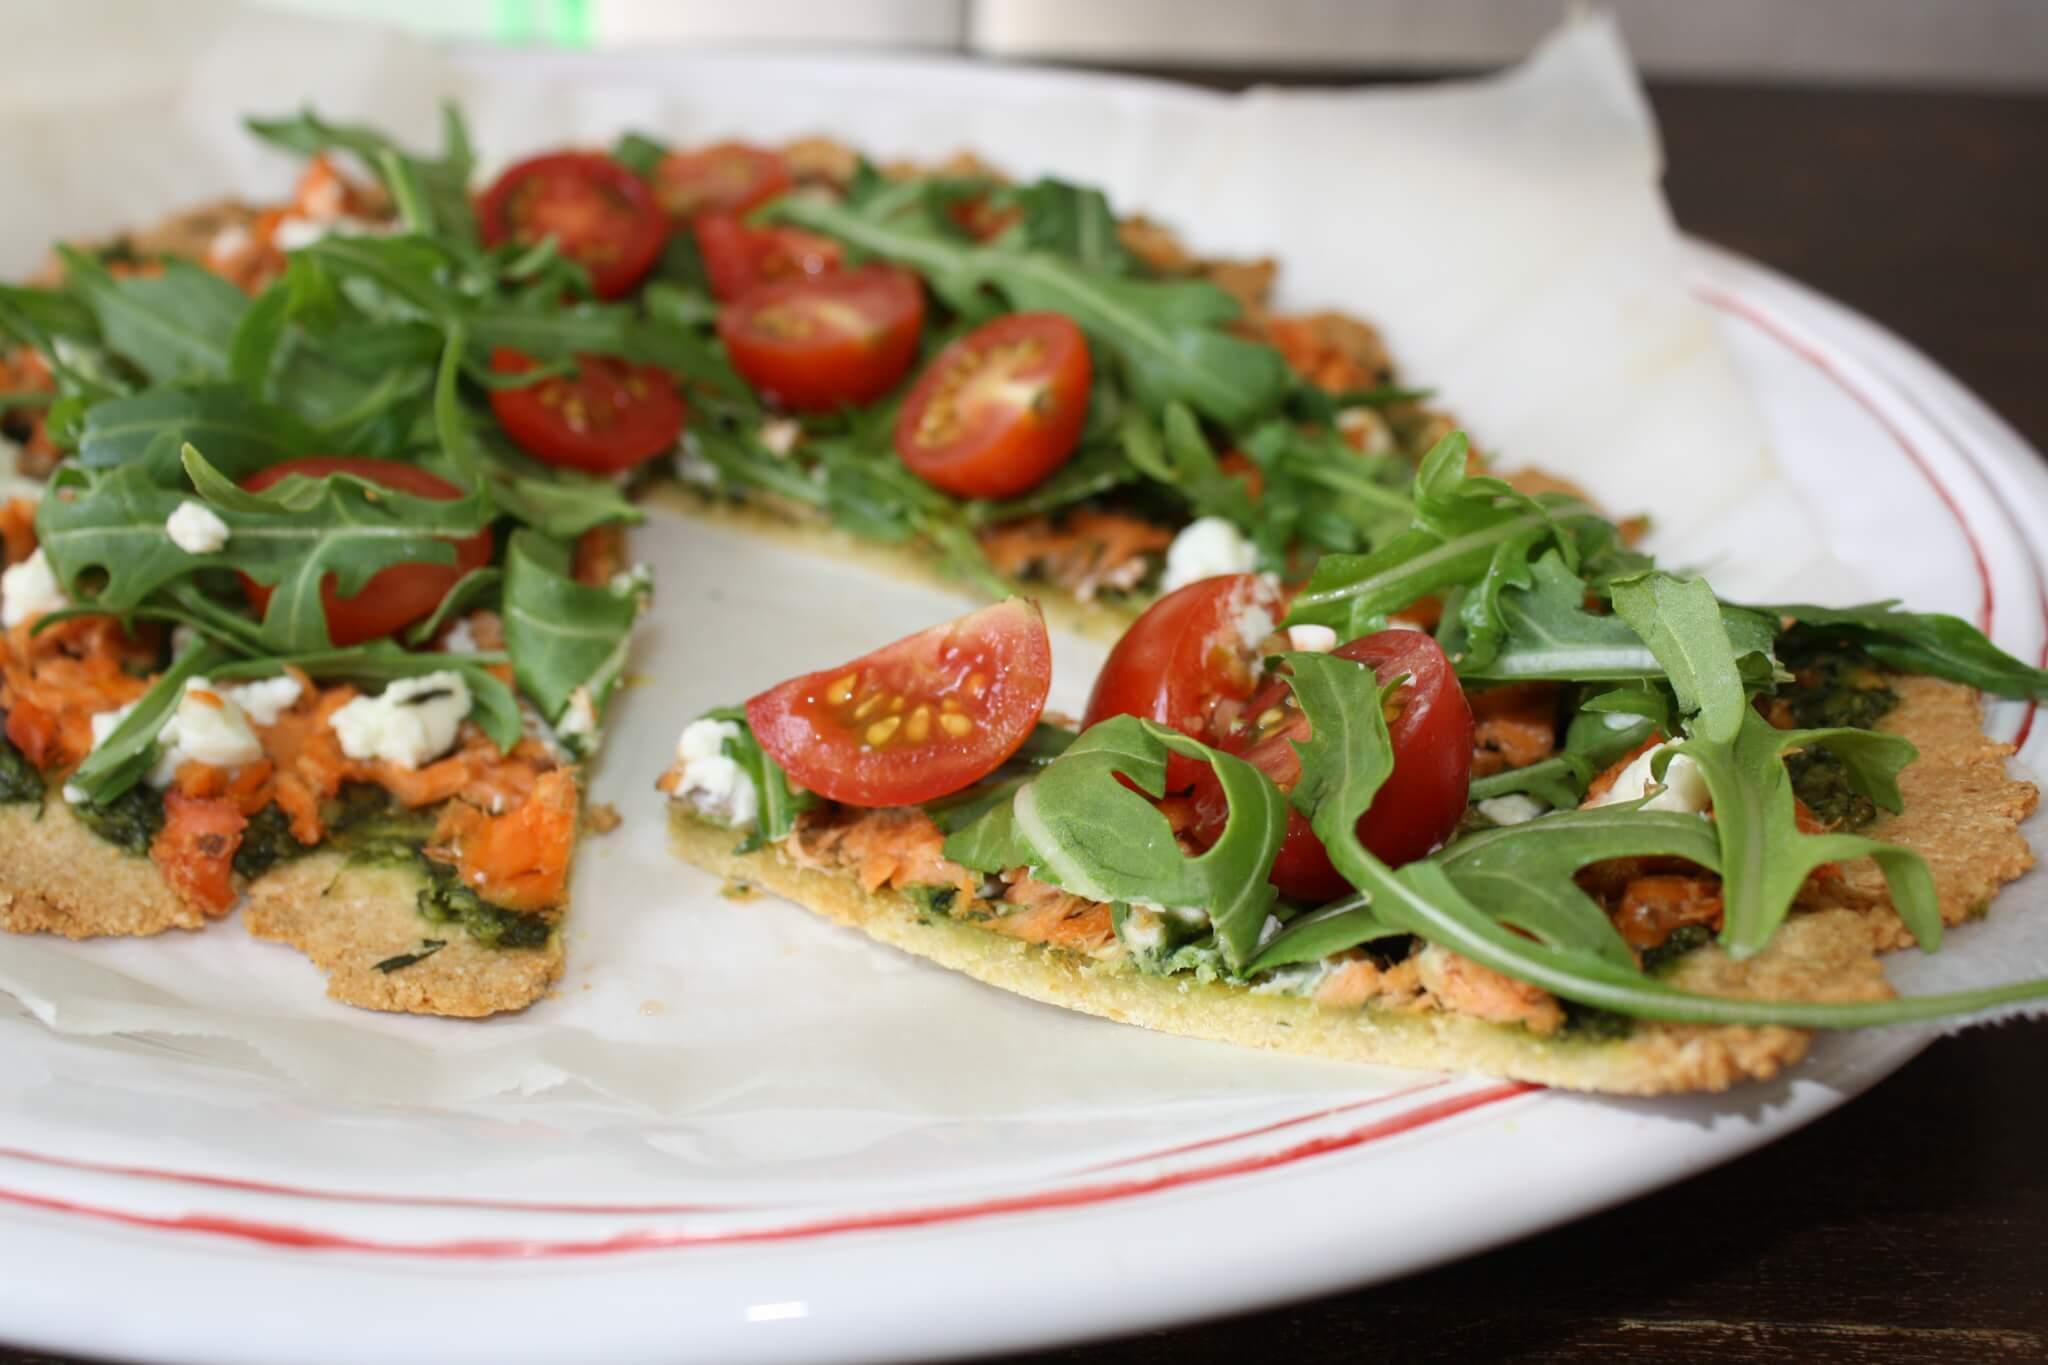 Gluten-Free Salmon, Pesto & Goats Cheese Pizza! - Move Nourish Believe